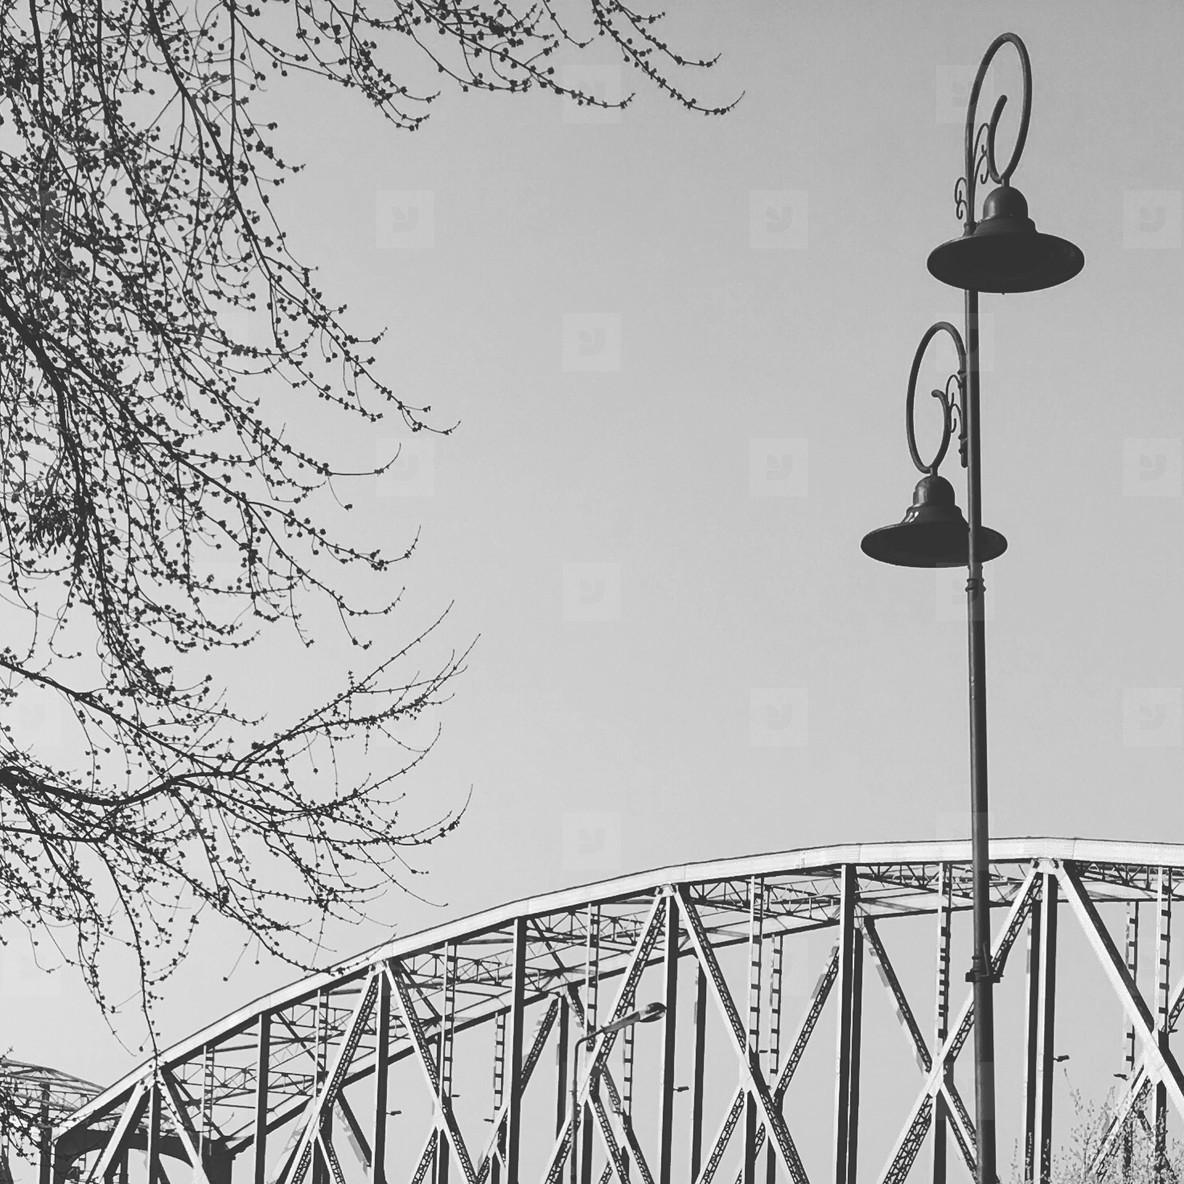 Decorative Bridge